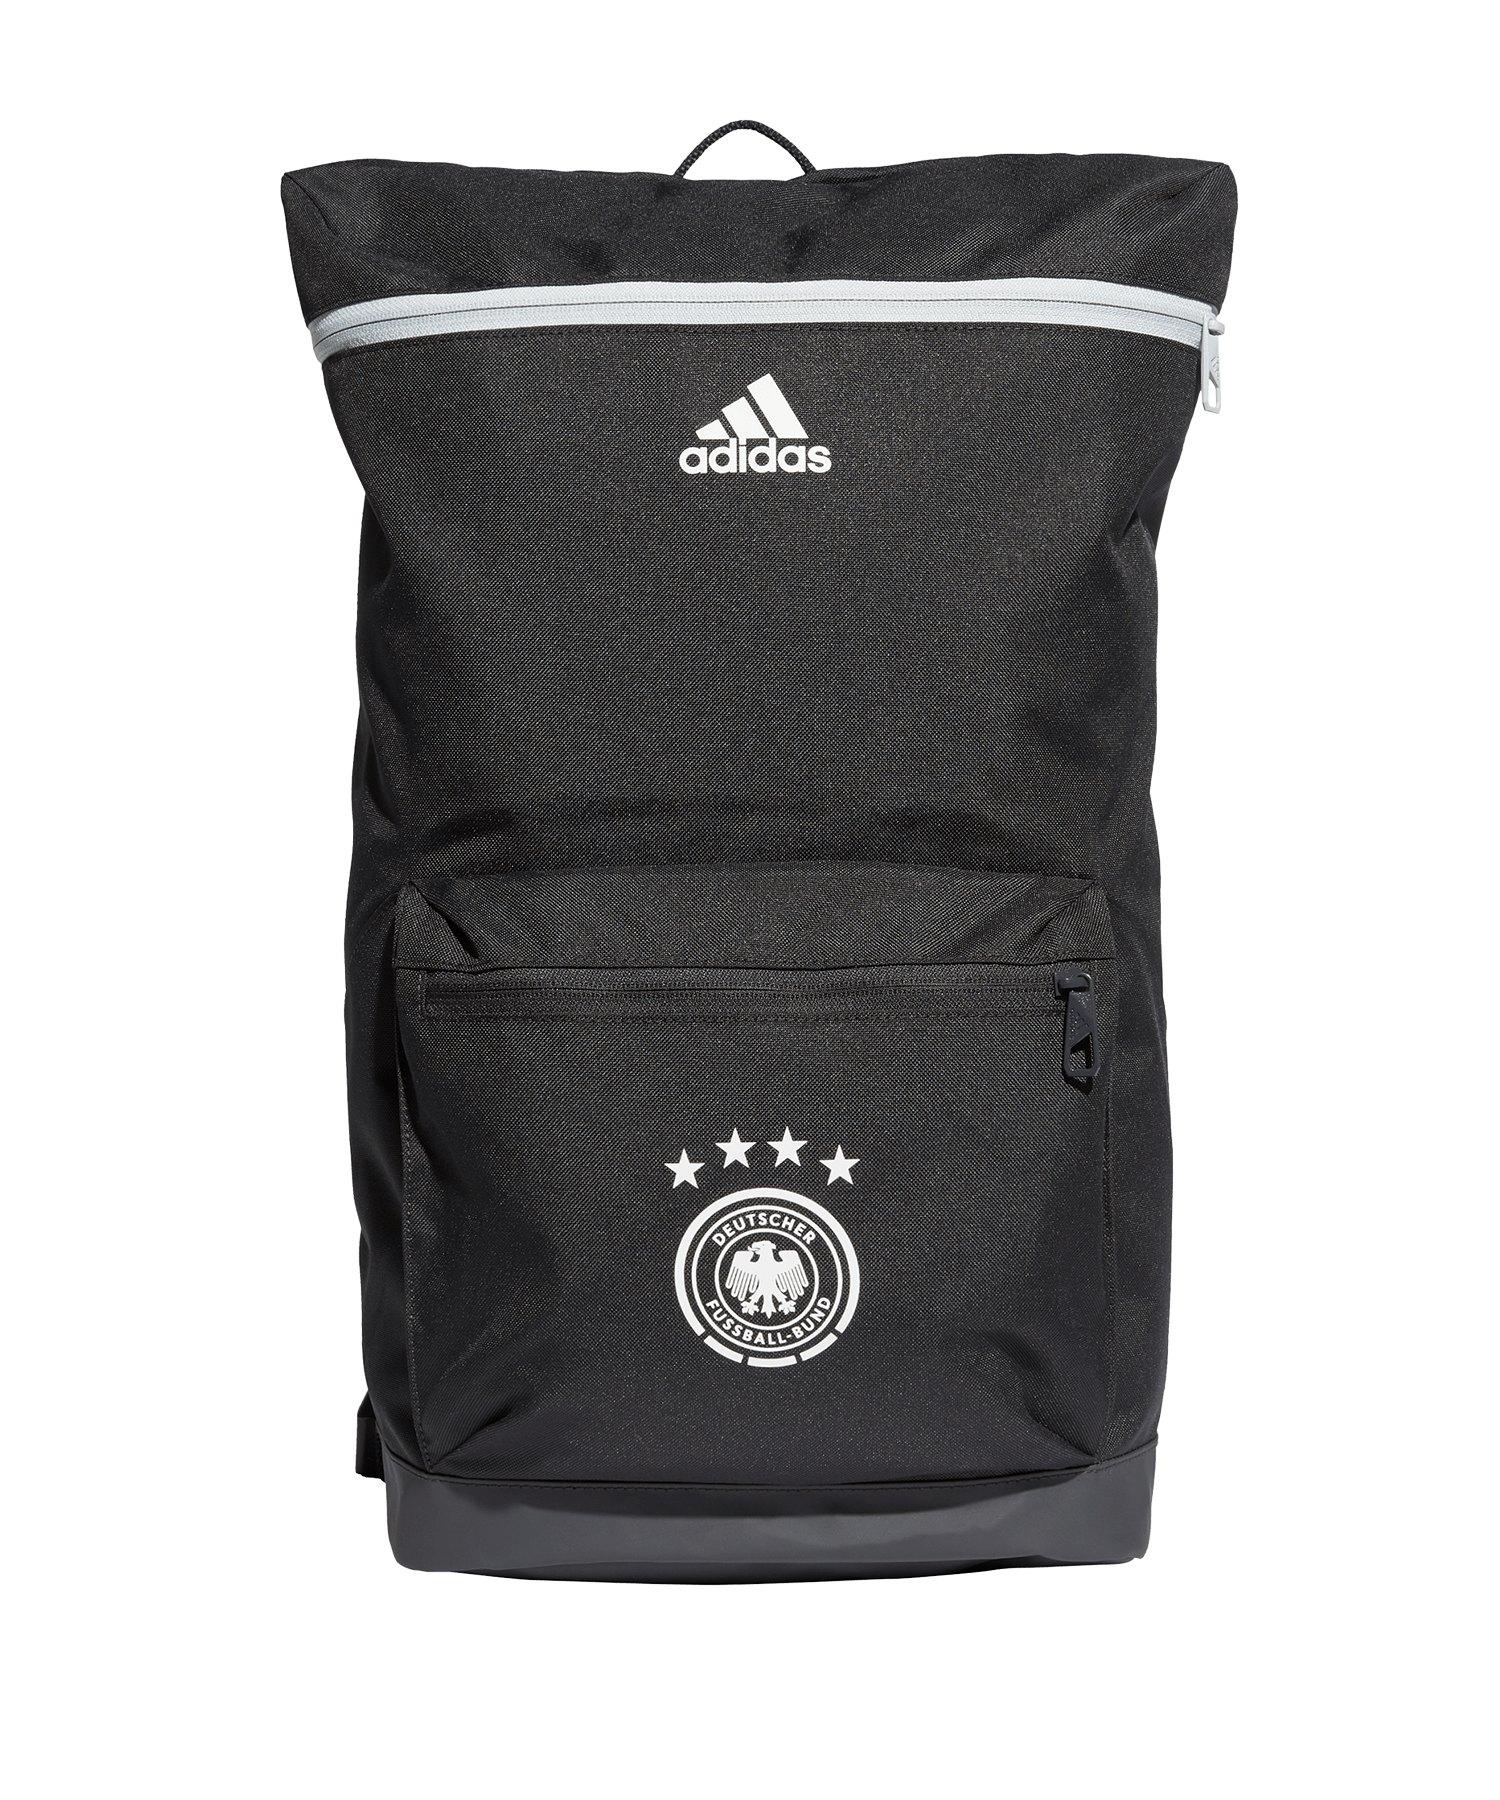 adidas DFB Deutschland Rucksack Grau Weiss - grau